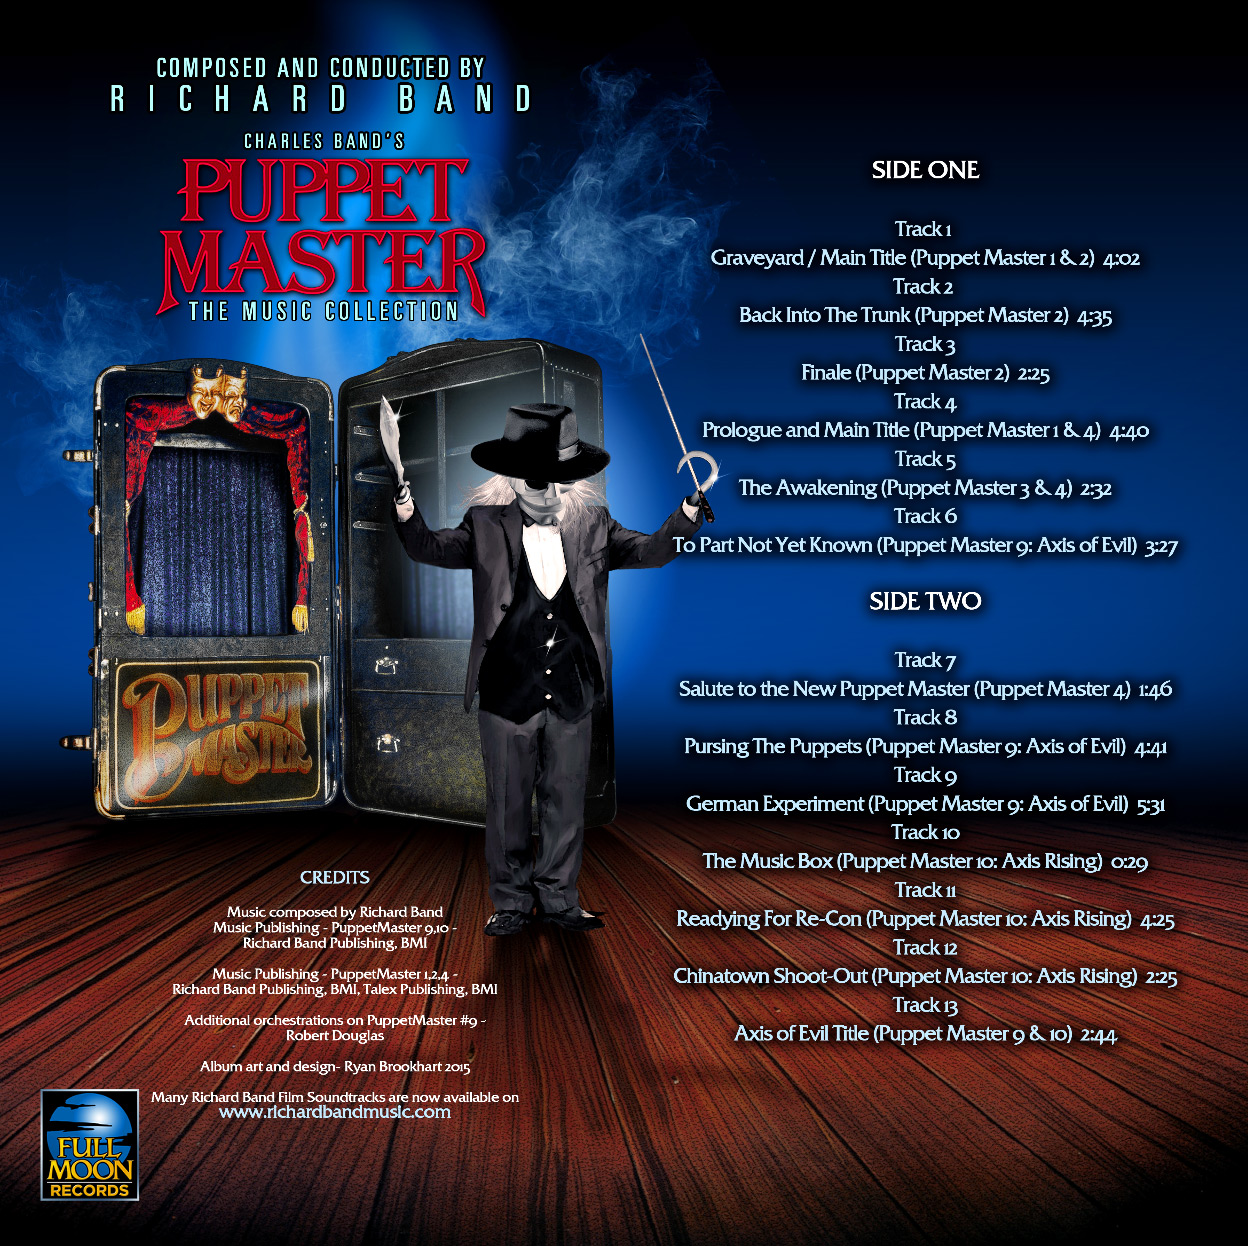 tmp_2F1442343836550-63t1ol9m7xa2lnmi-05113947af98aa35755ed3c287edc47b_2FPuppet-Master-Vinyl-LP-Back